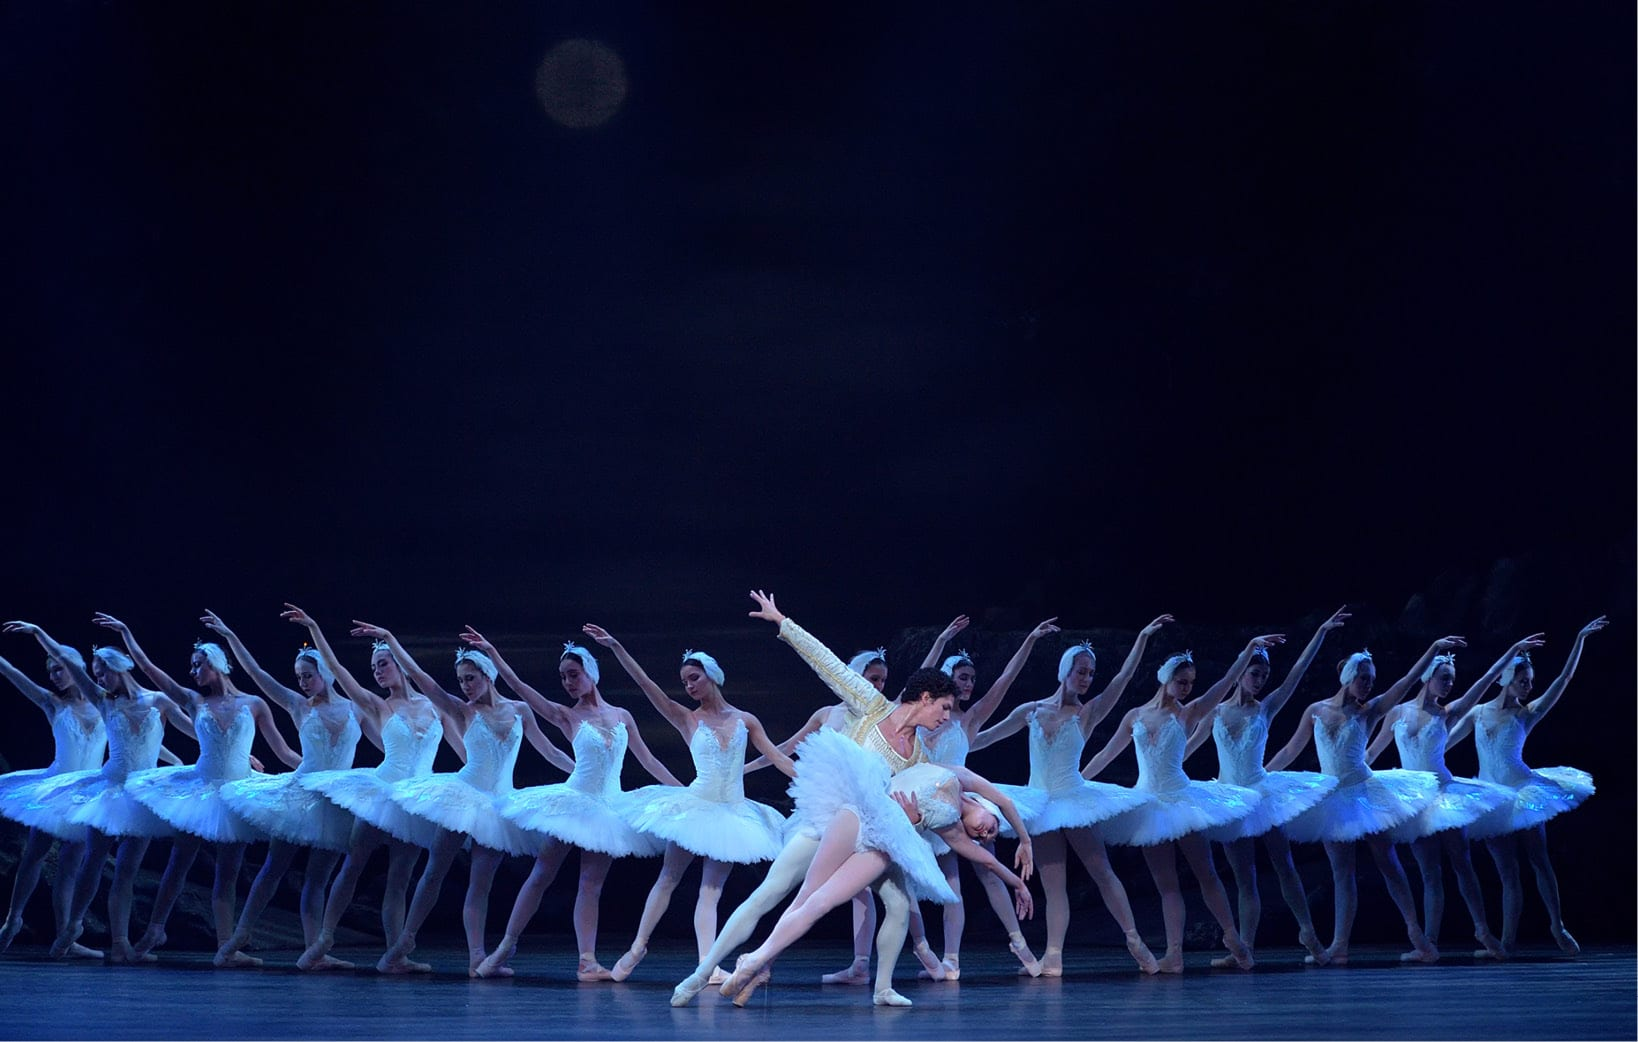 https://www.londoncityisland.com/wp-content/uploads/2021/03/LCI_web_ballet_5.jpg